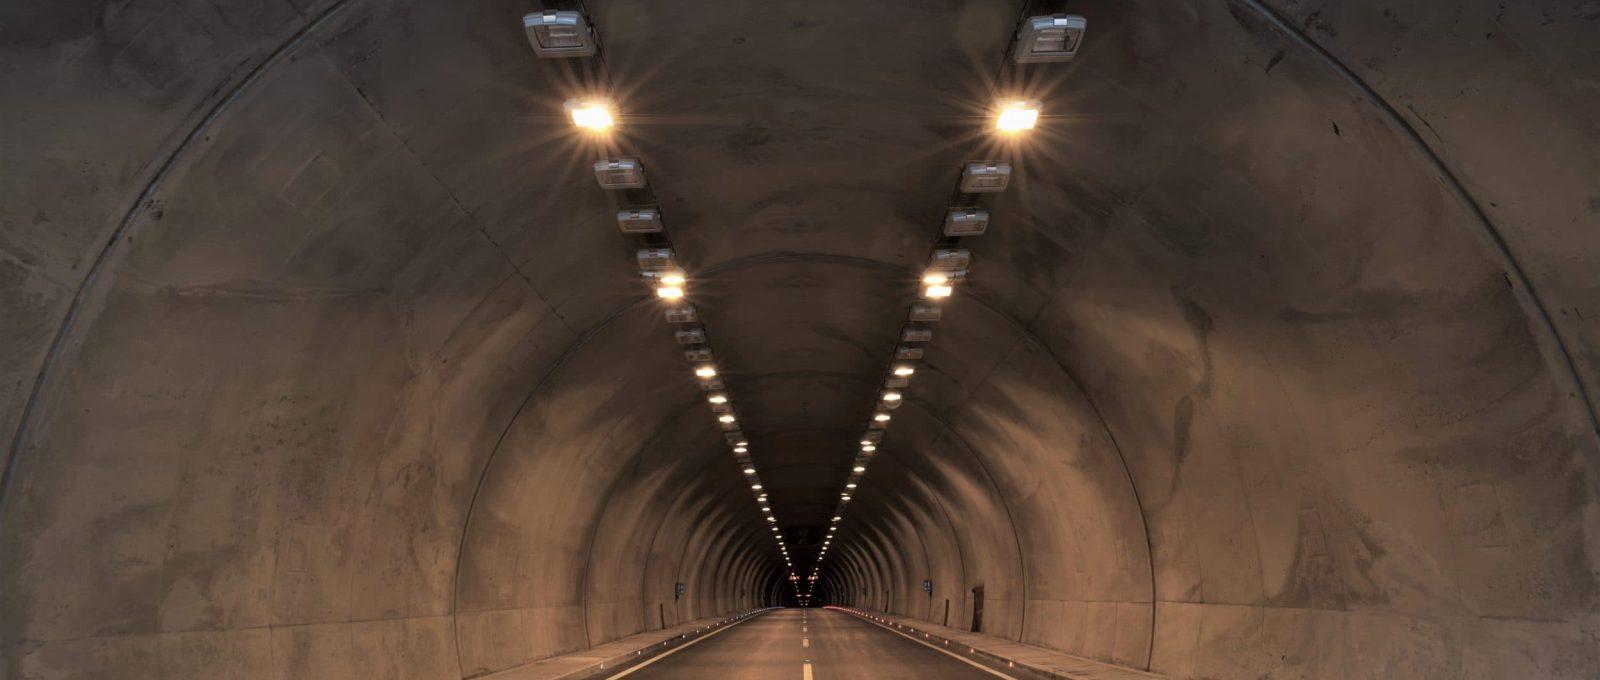 Tunnelalarmierung